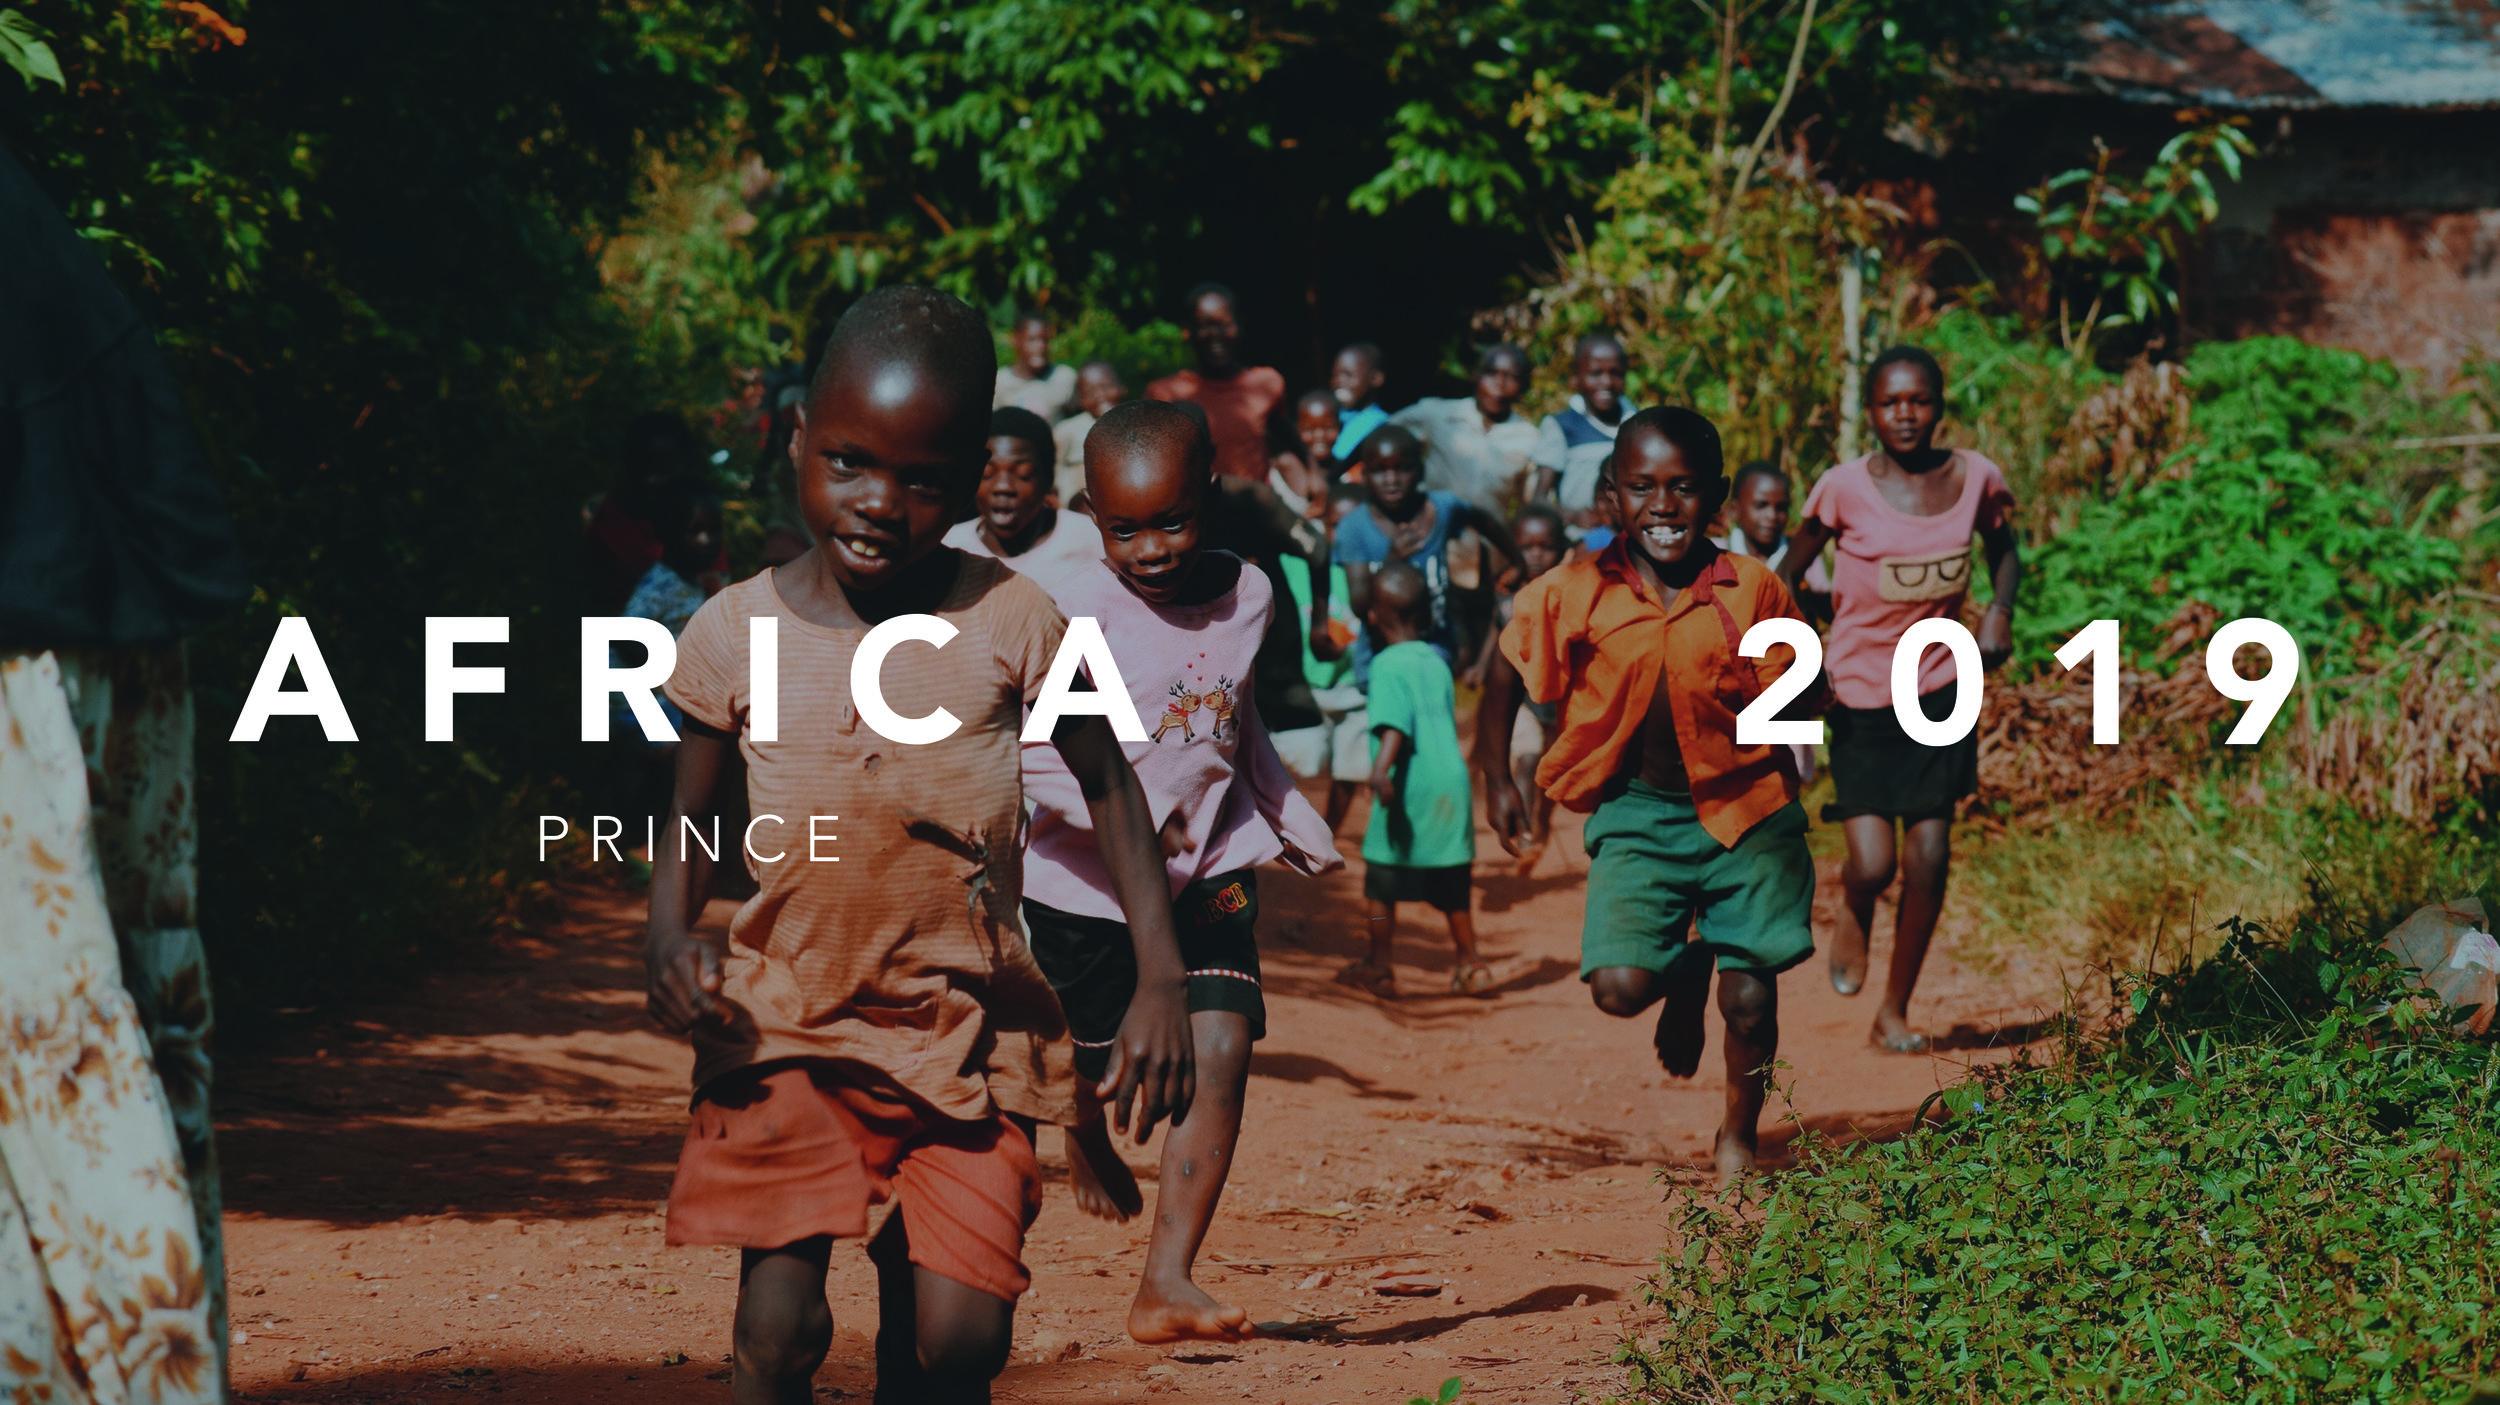 AFRICA-prince.jpg